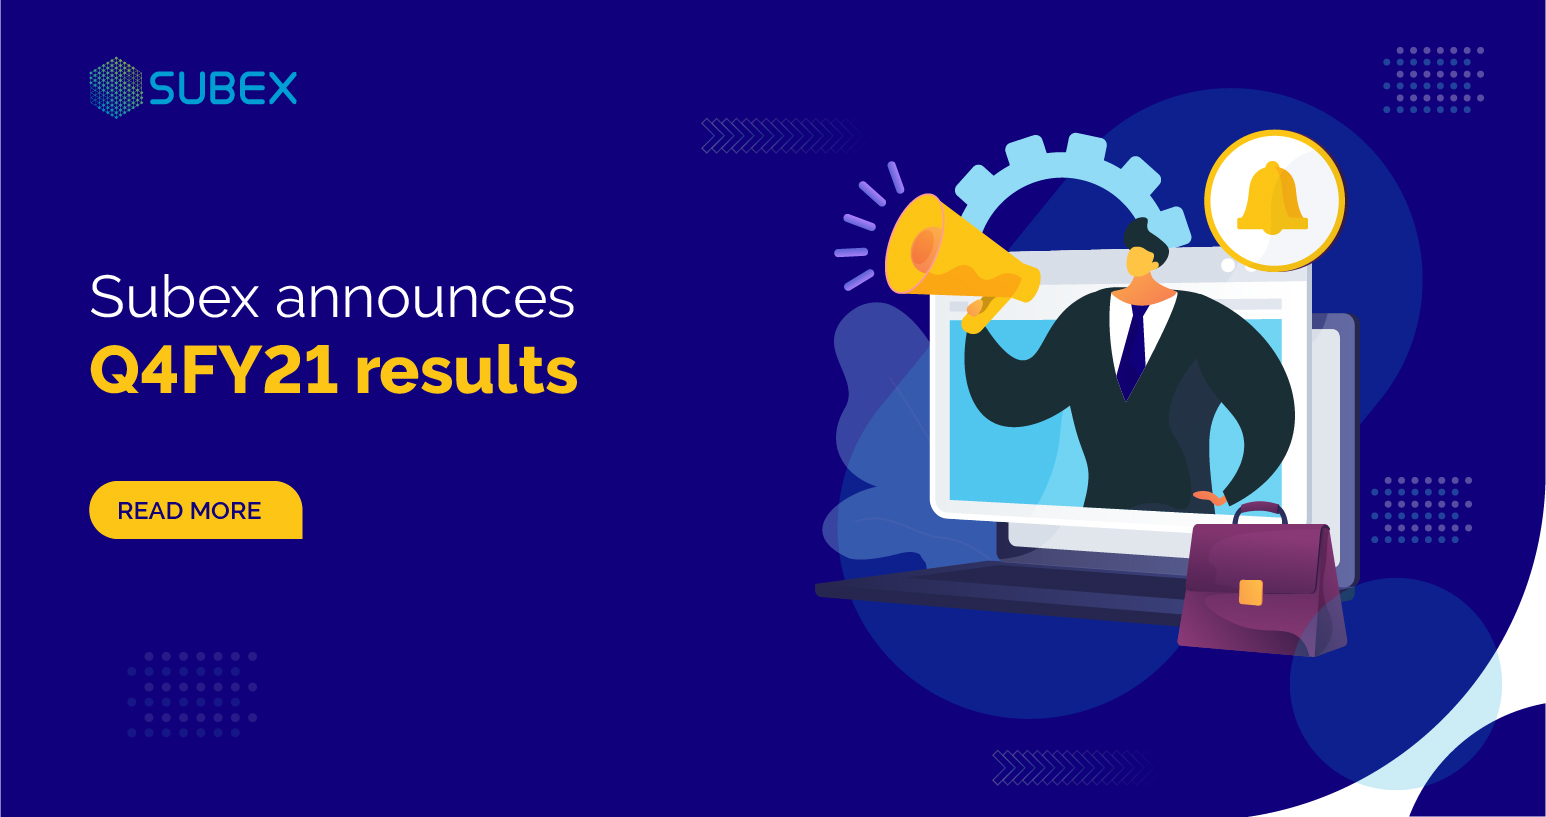 Subex announces Q4FY21 results